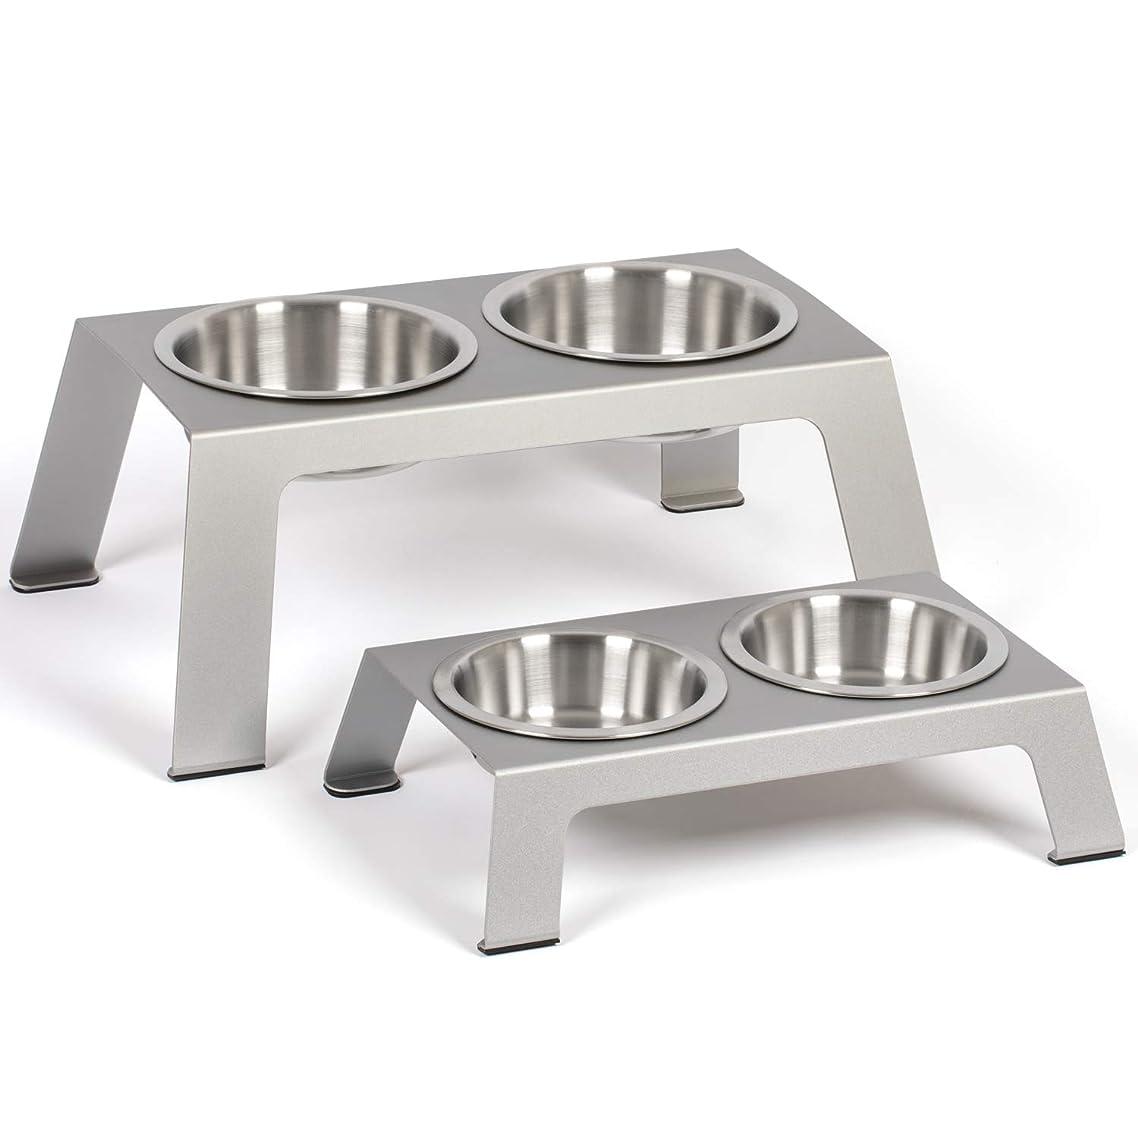 PetFusion Elevated Dog Bowls, Cat Bowls -- Premium anodized Aluminum feeder (Short 4